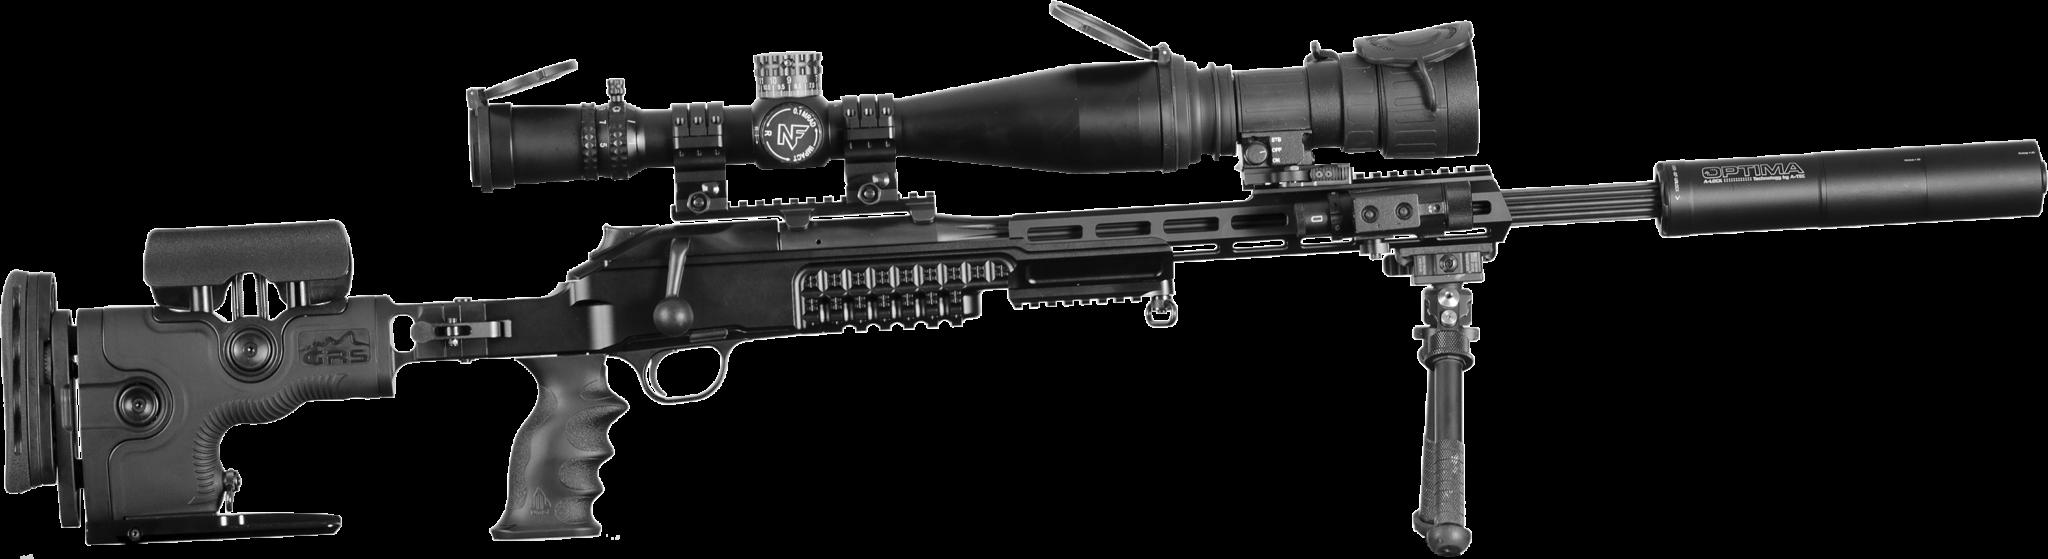 Grs Ragnarok Rightview Rifle Blaser R8